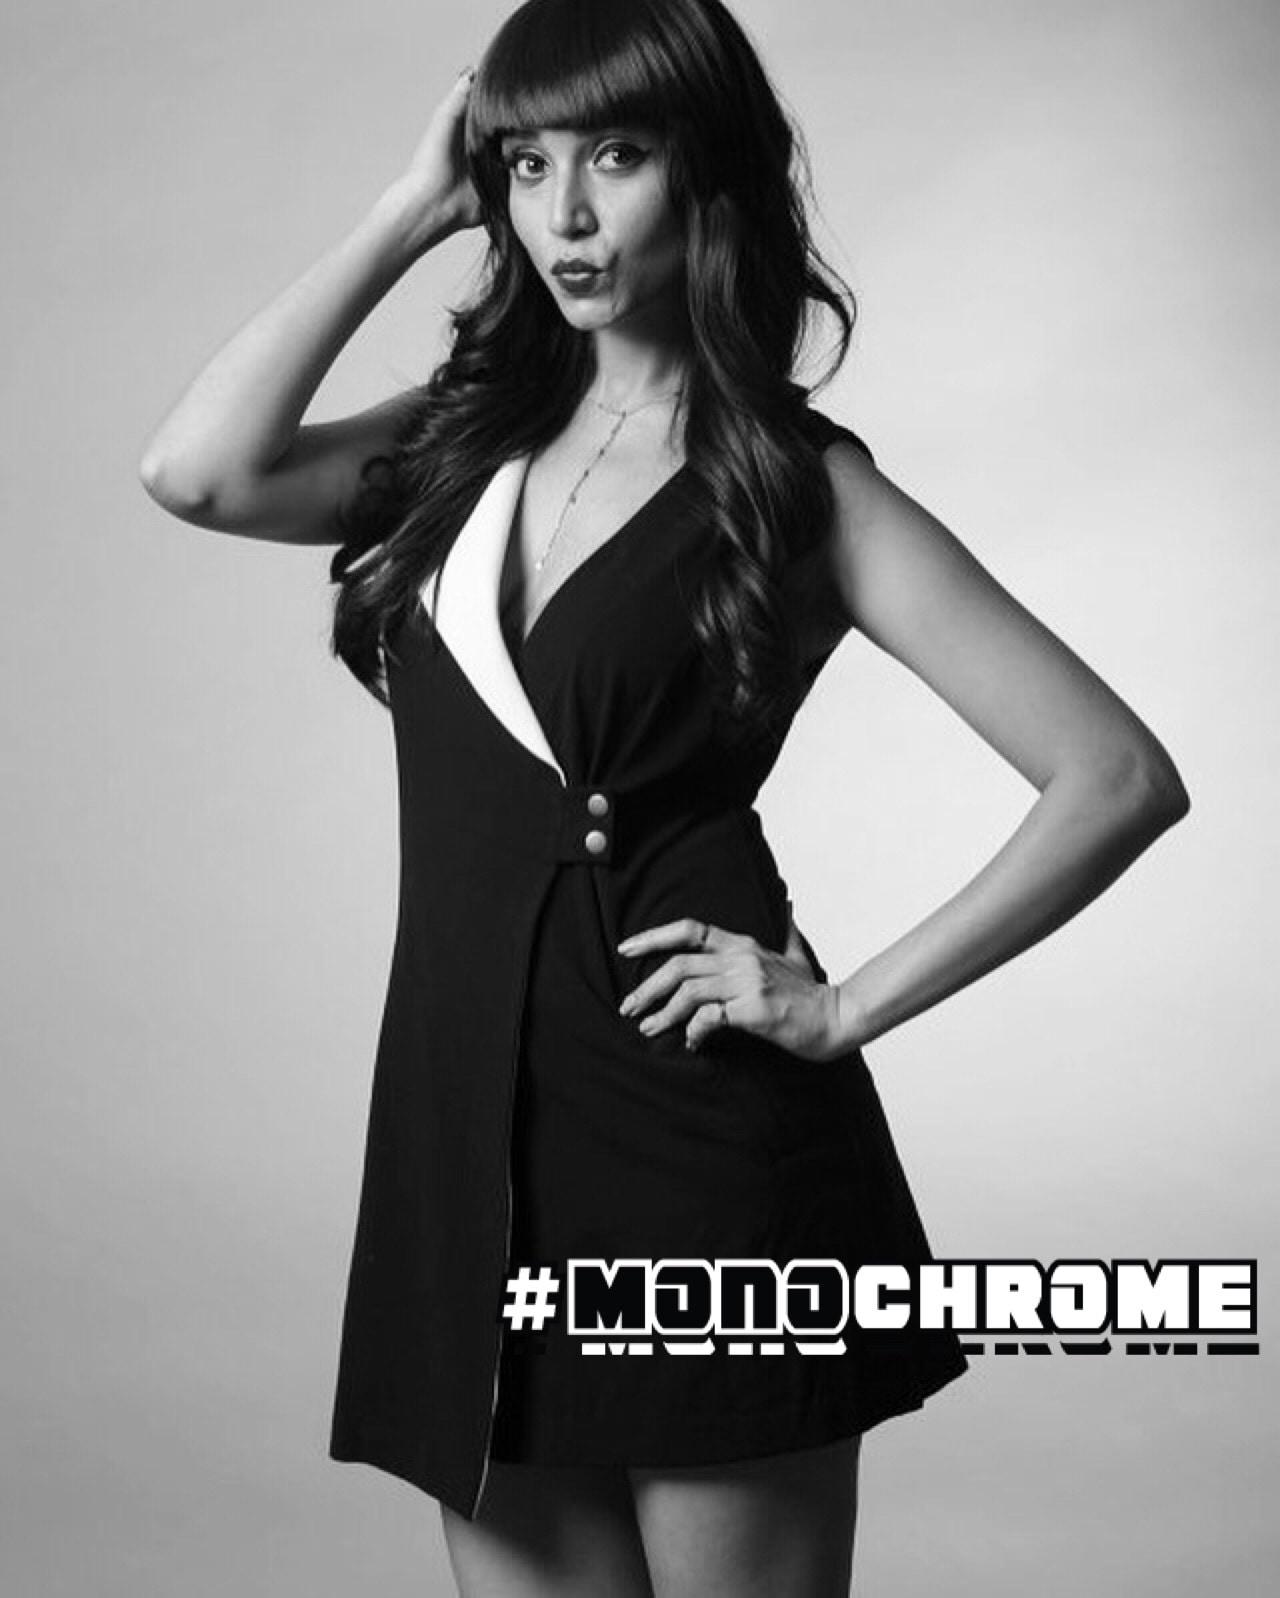 #monochrome